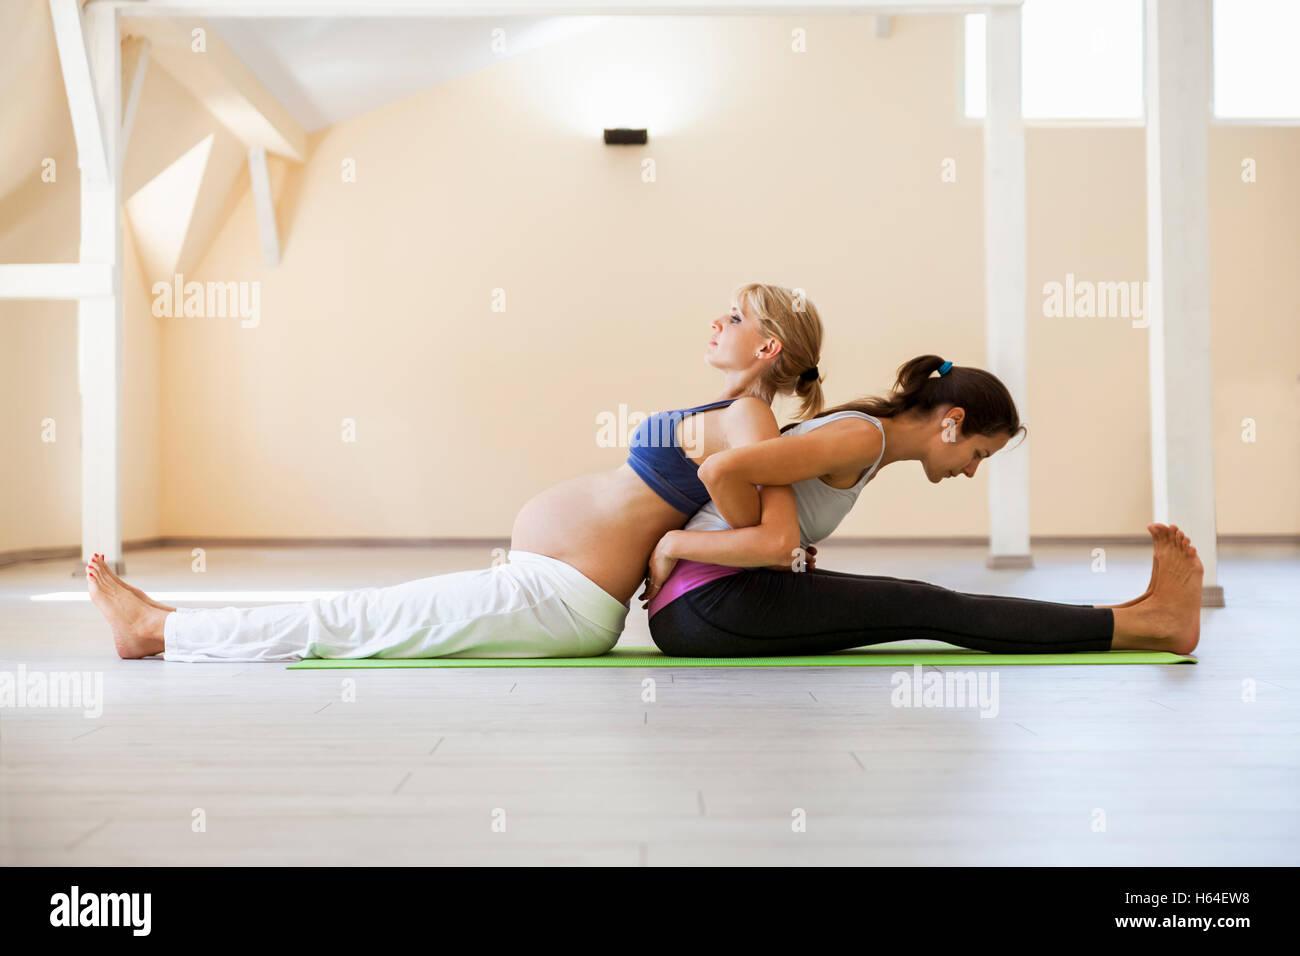 Prenatal Yoga Female Yoga Instructor Stock Photos Prenatal Yoga